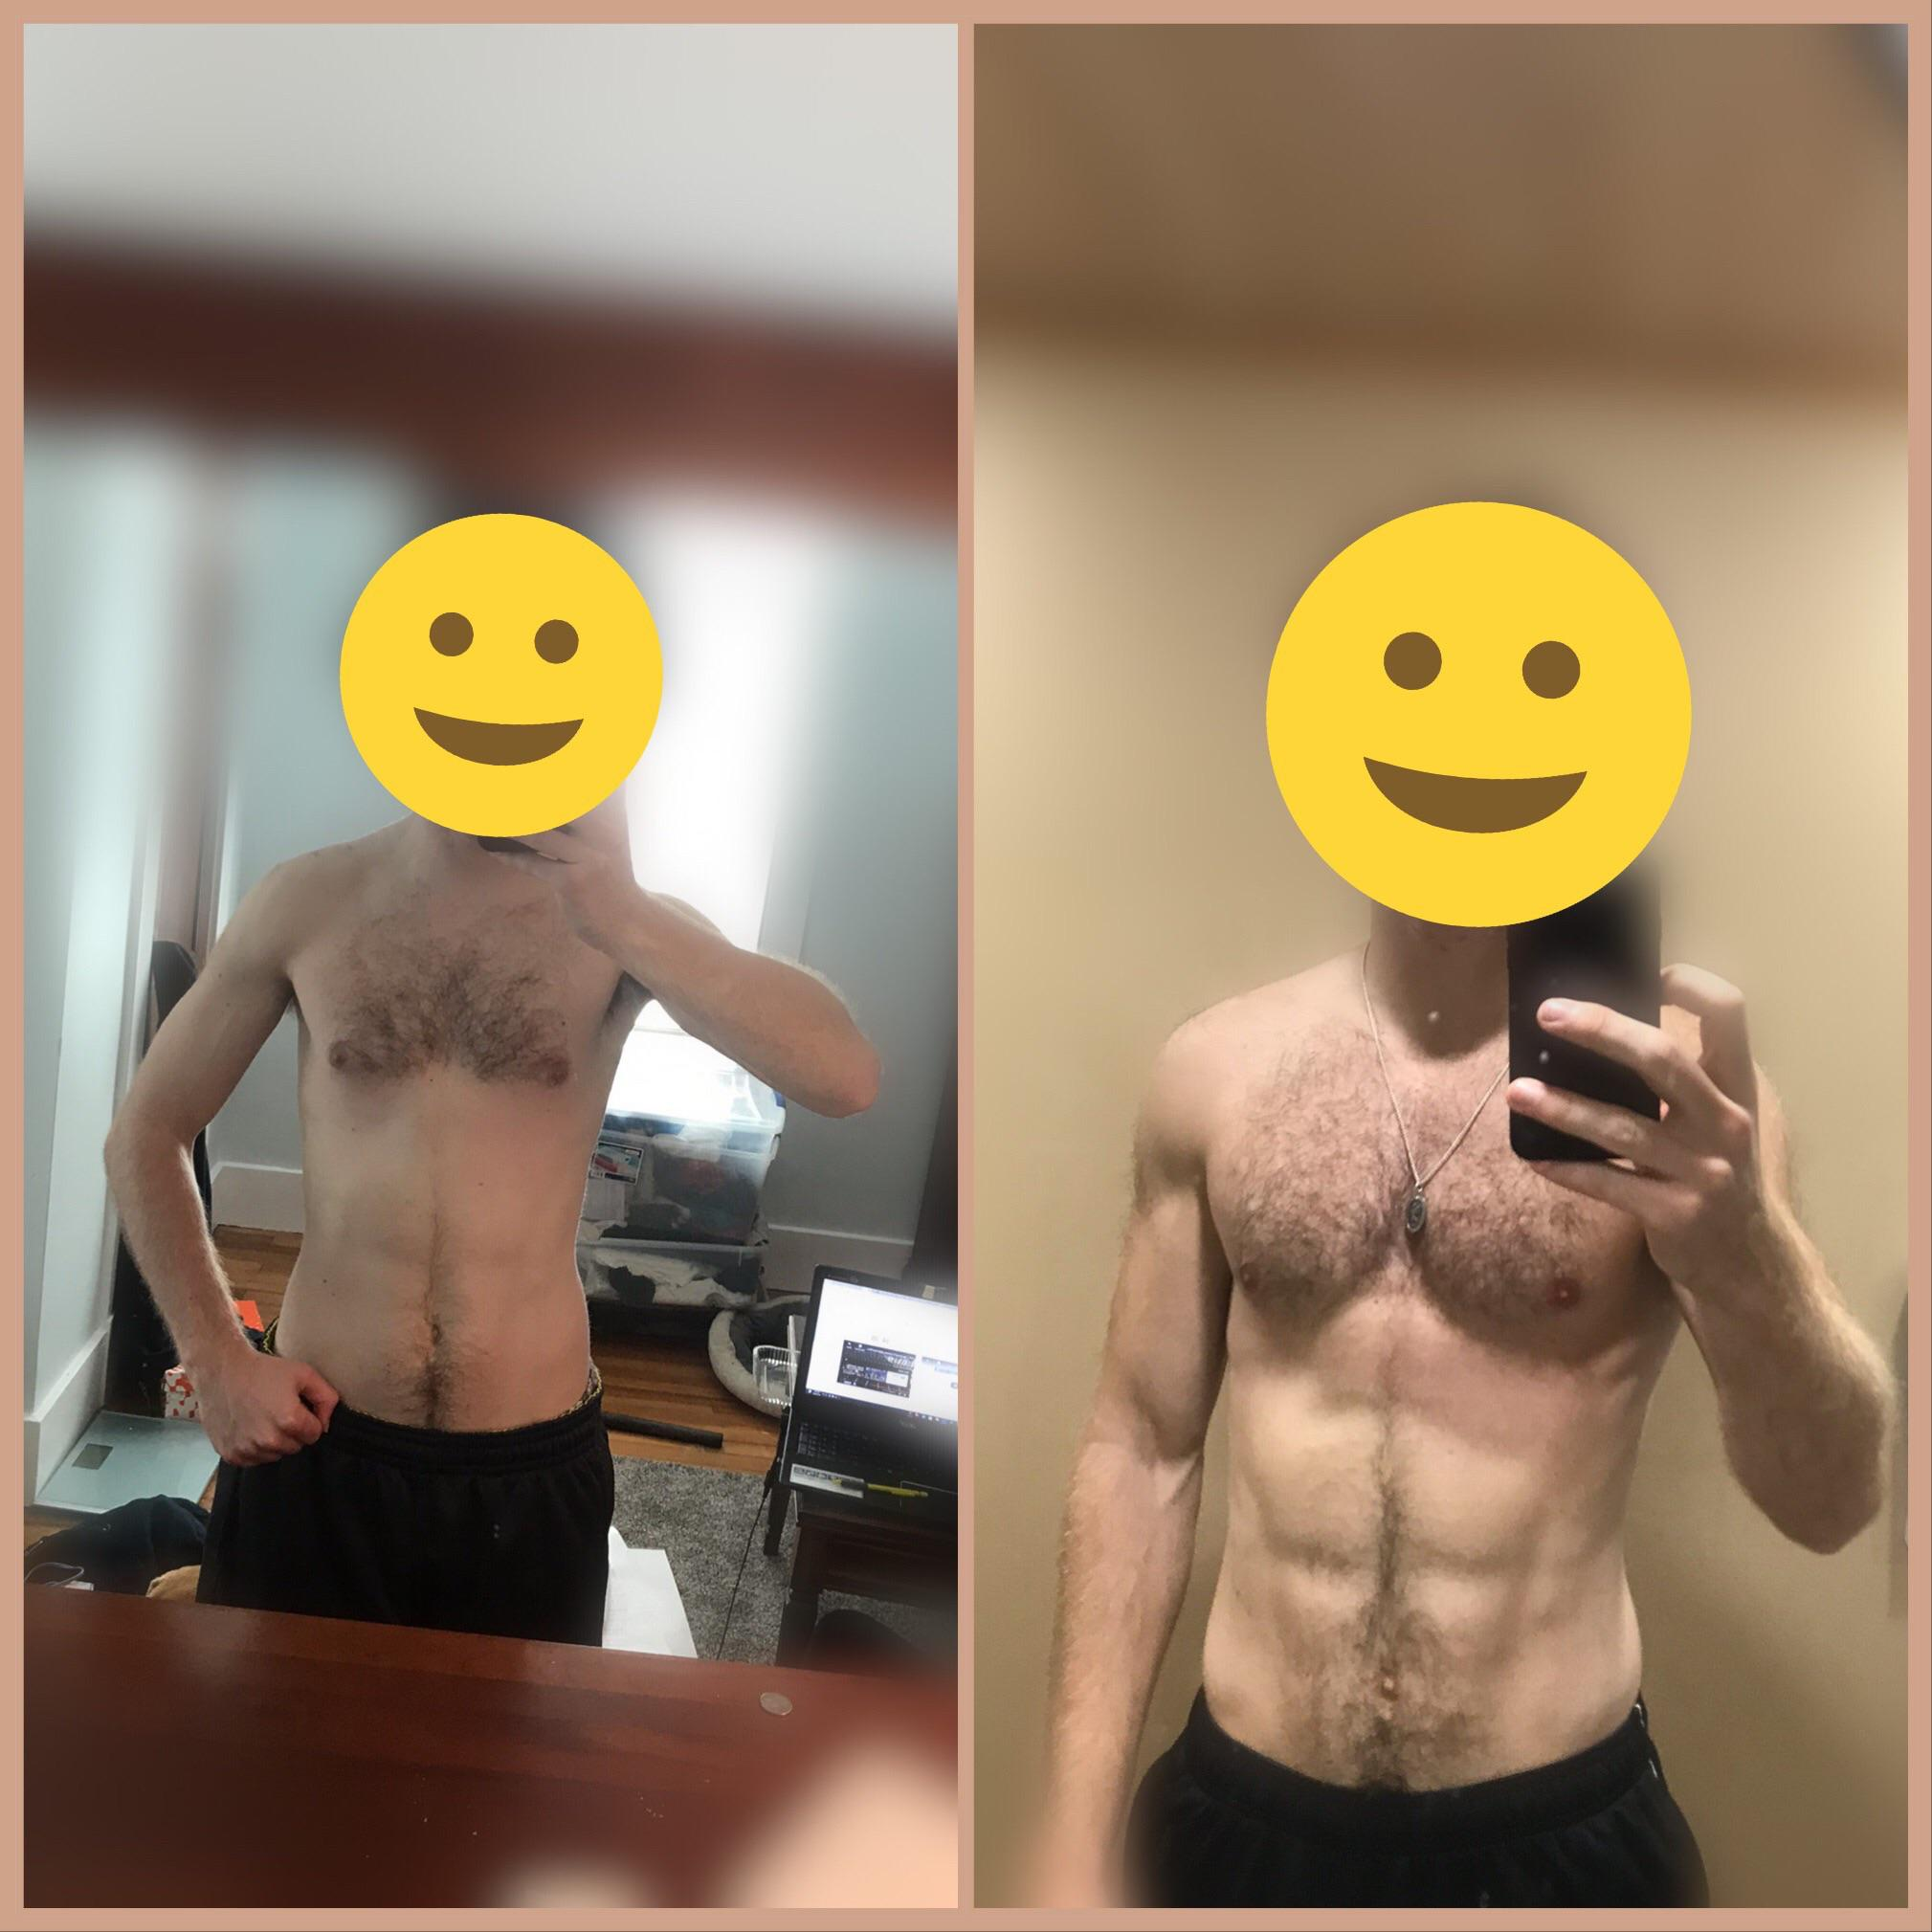 6 foot Male Progress Pics of 10 lbs Weight Gain 145 lbs to 155 lbs